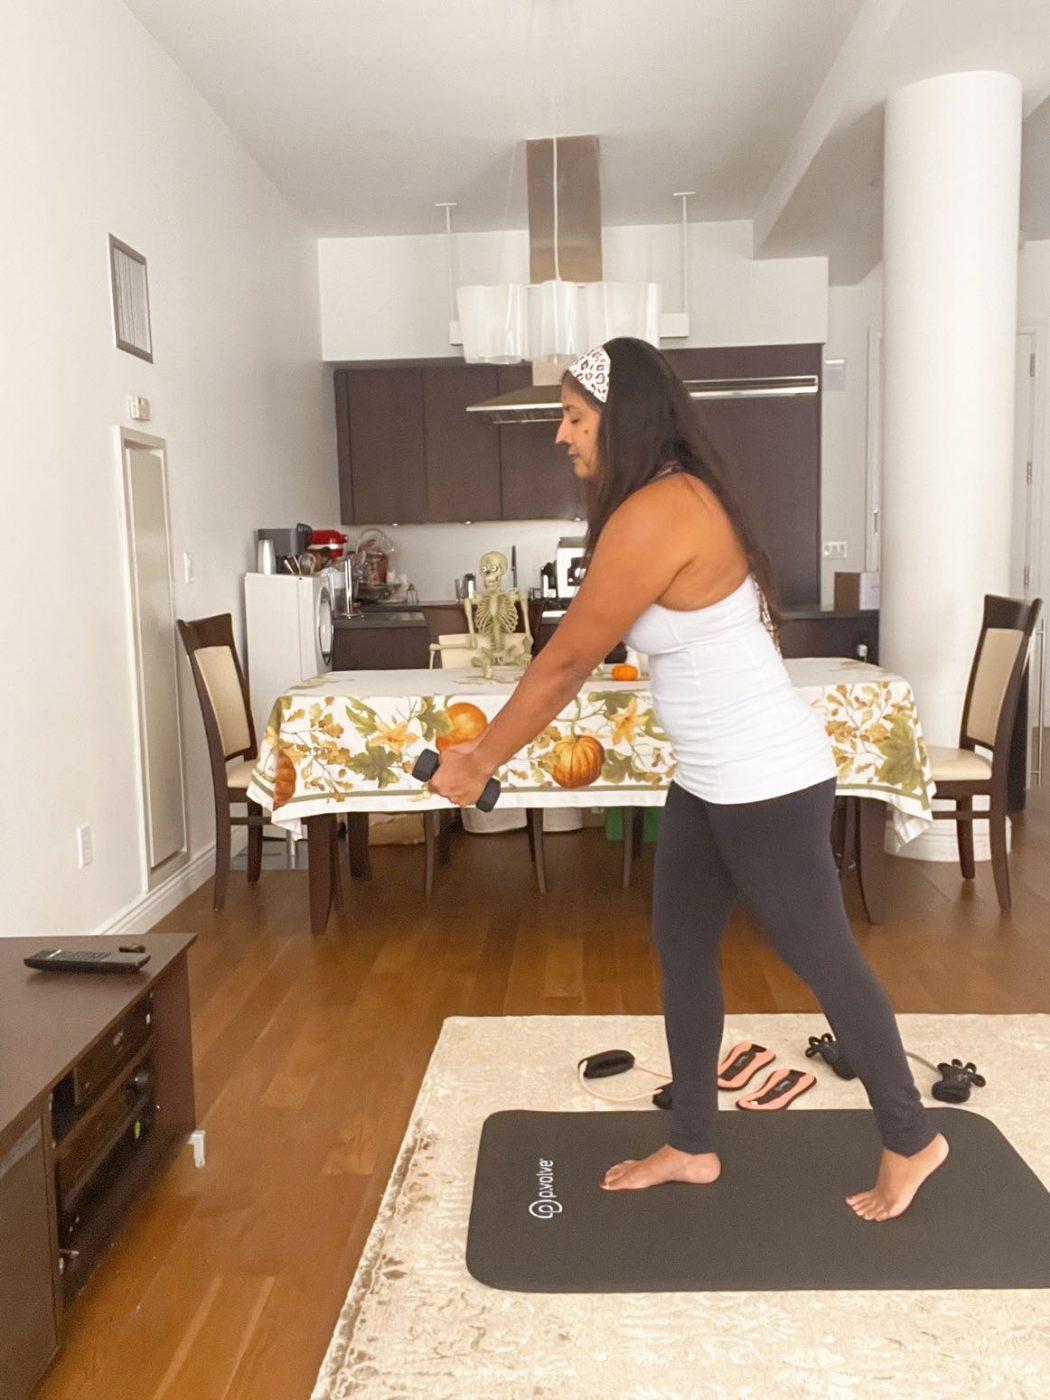 best workouts at home: P.volve. Halloween workout ideas. Light dumbbells.